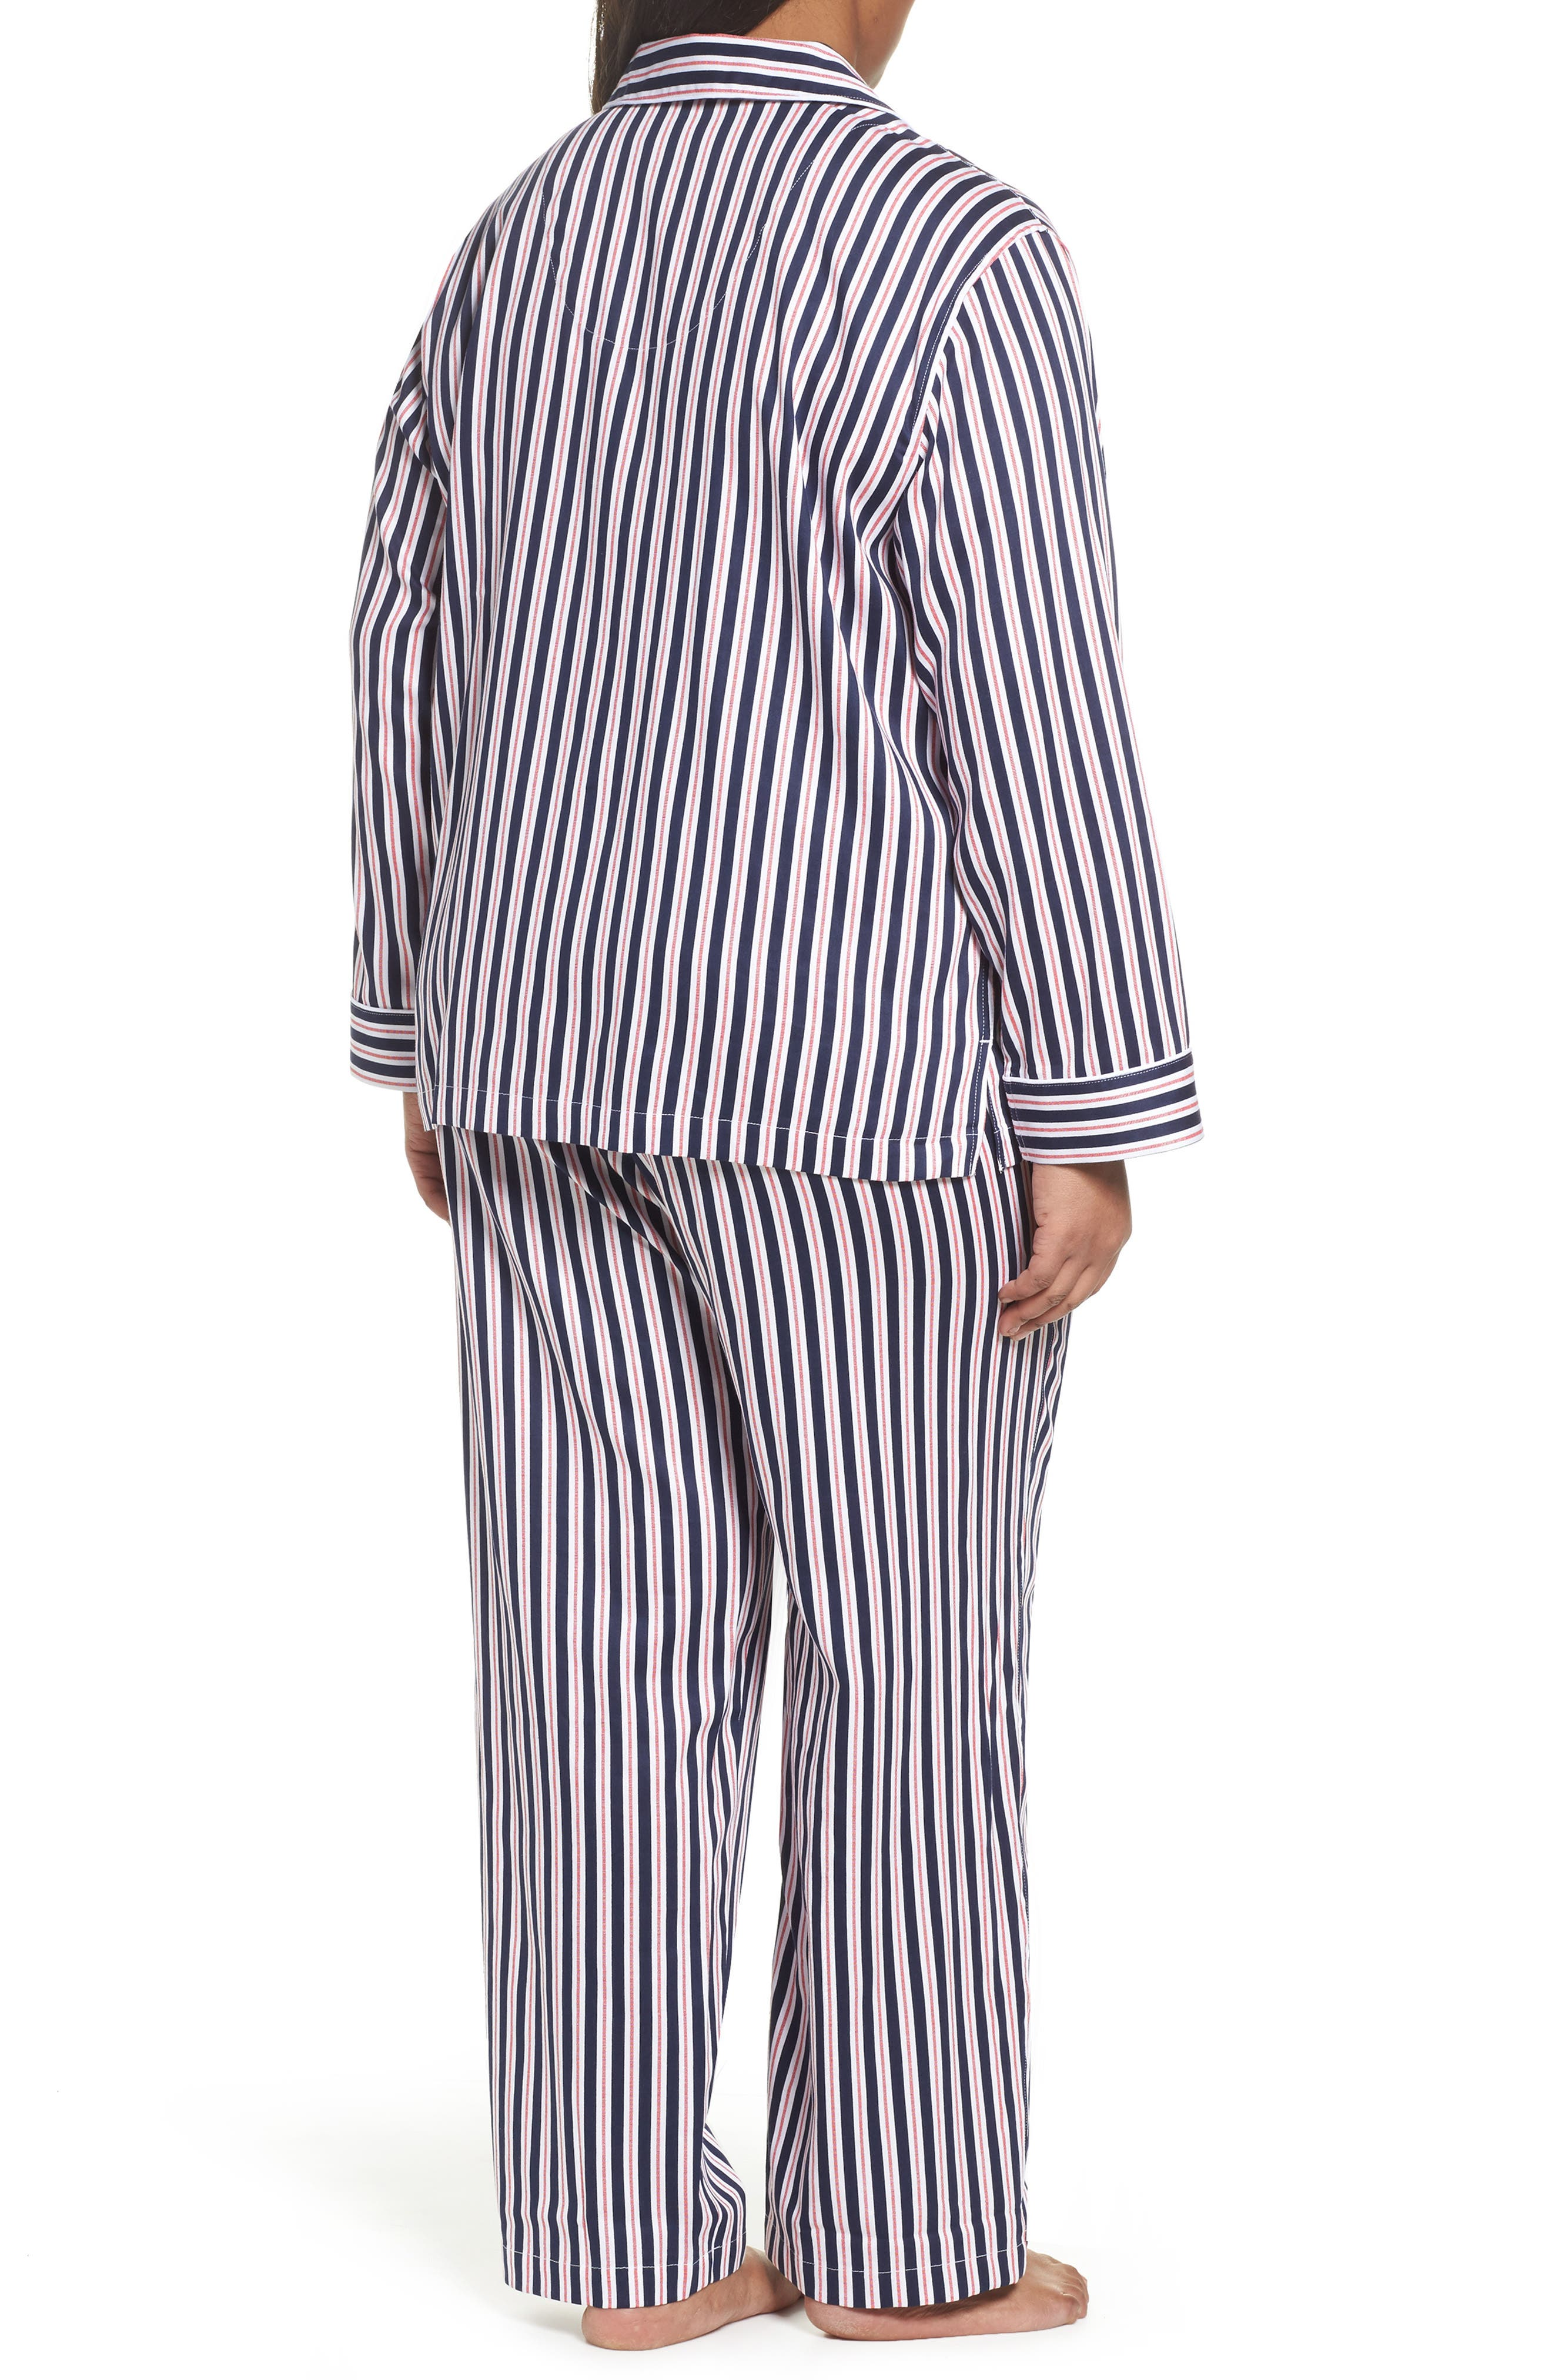 Sateen Pajamas,                             Alternate thumbnail 2, color,                             600